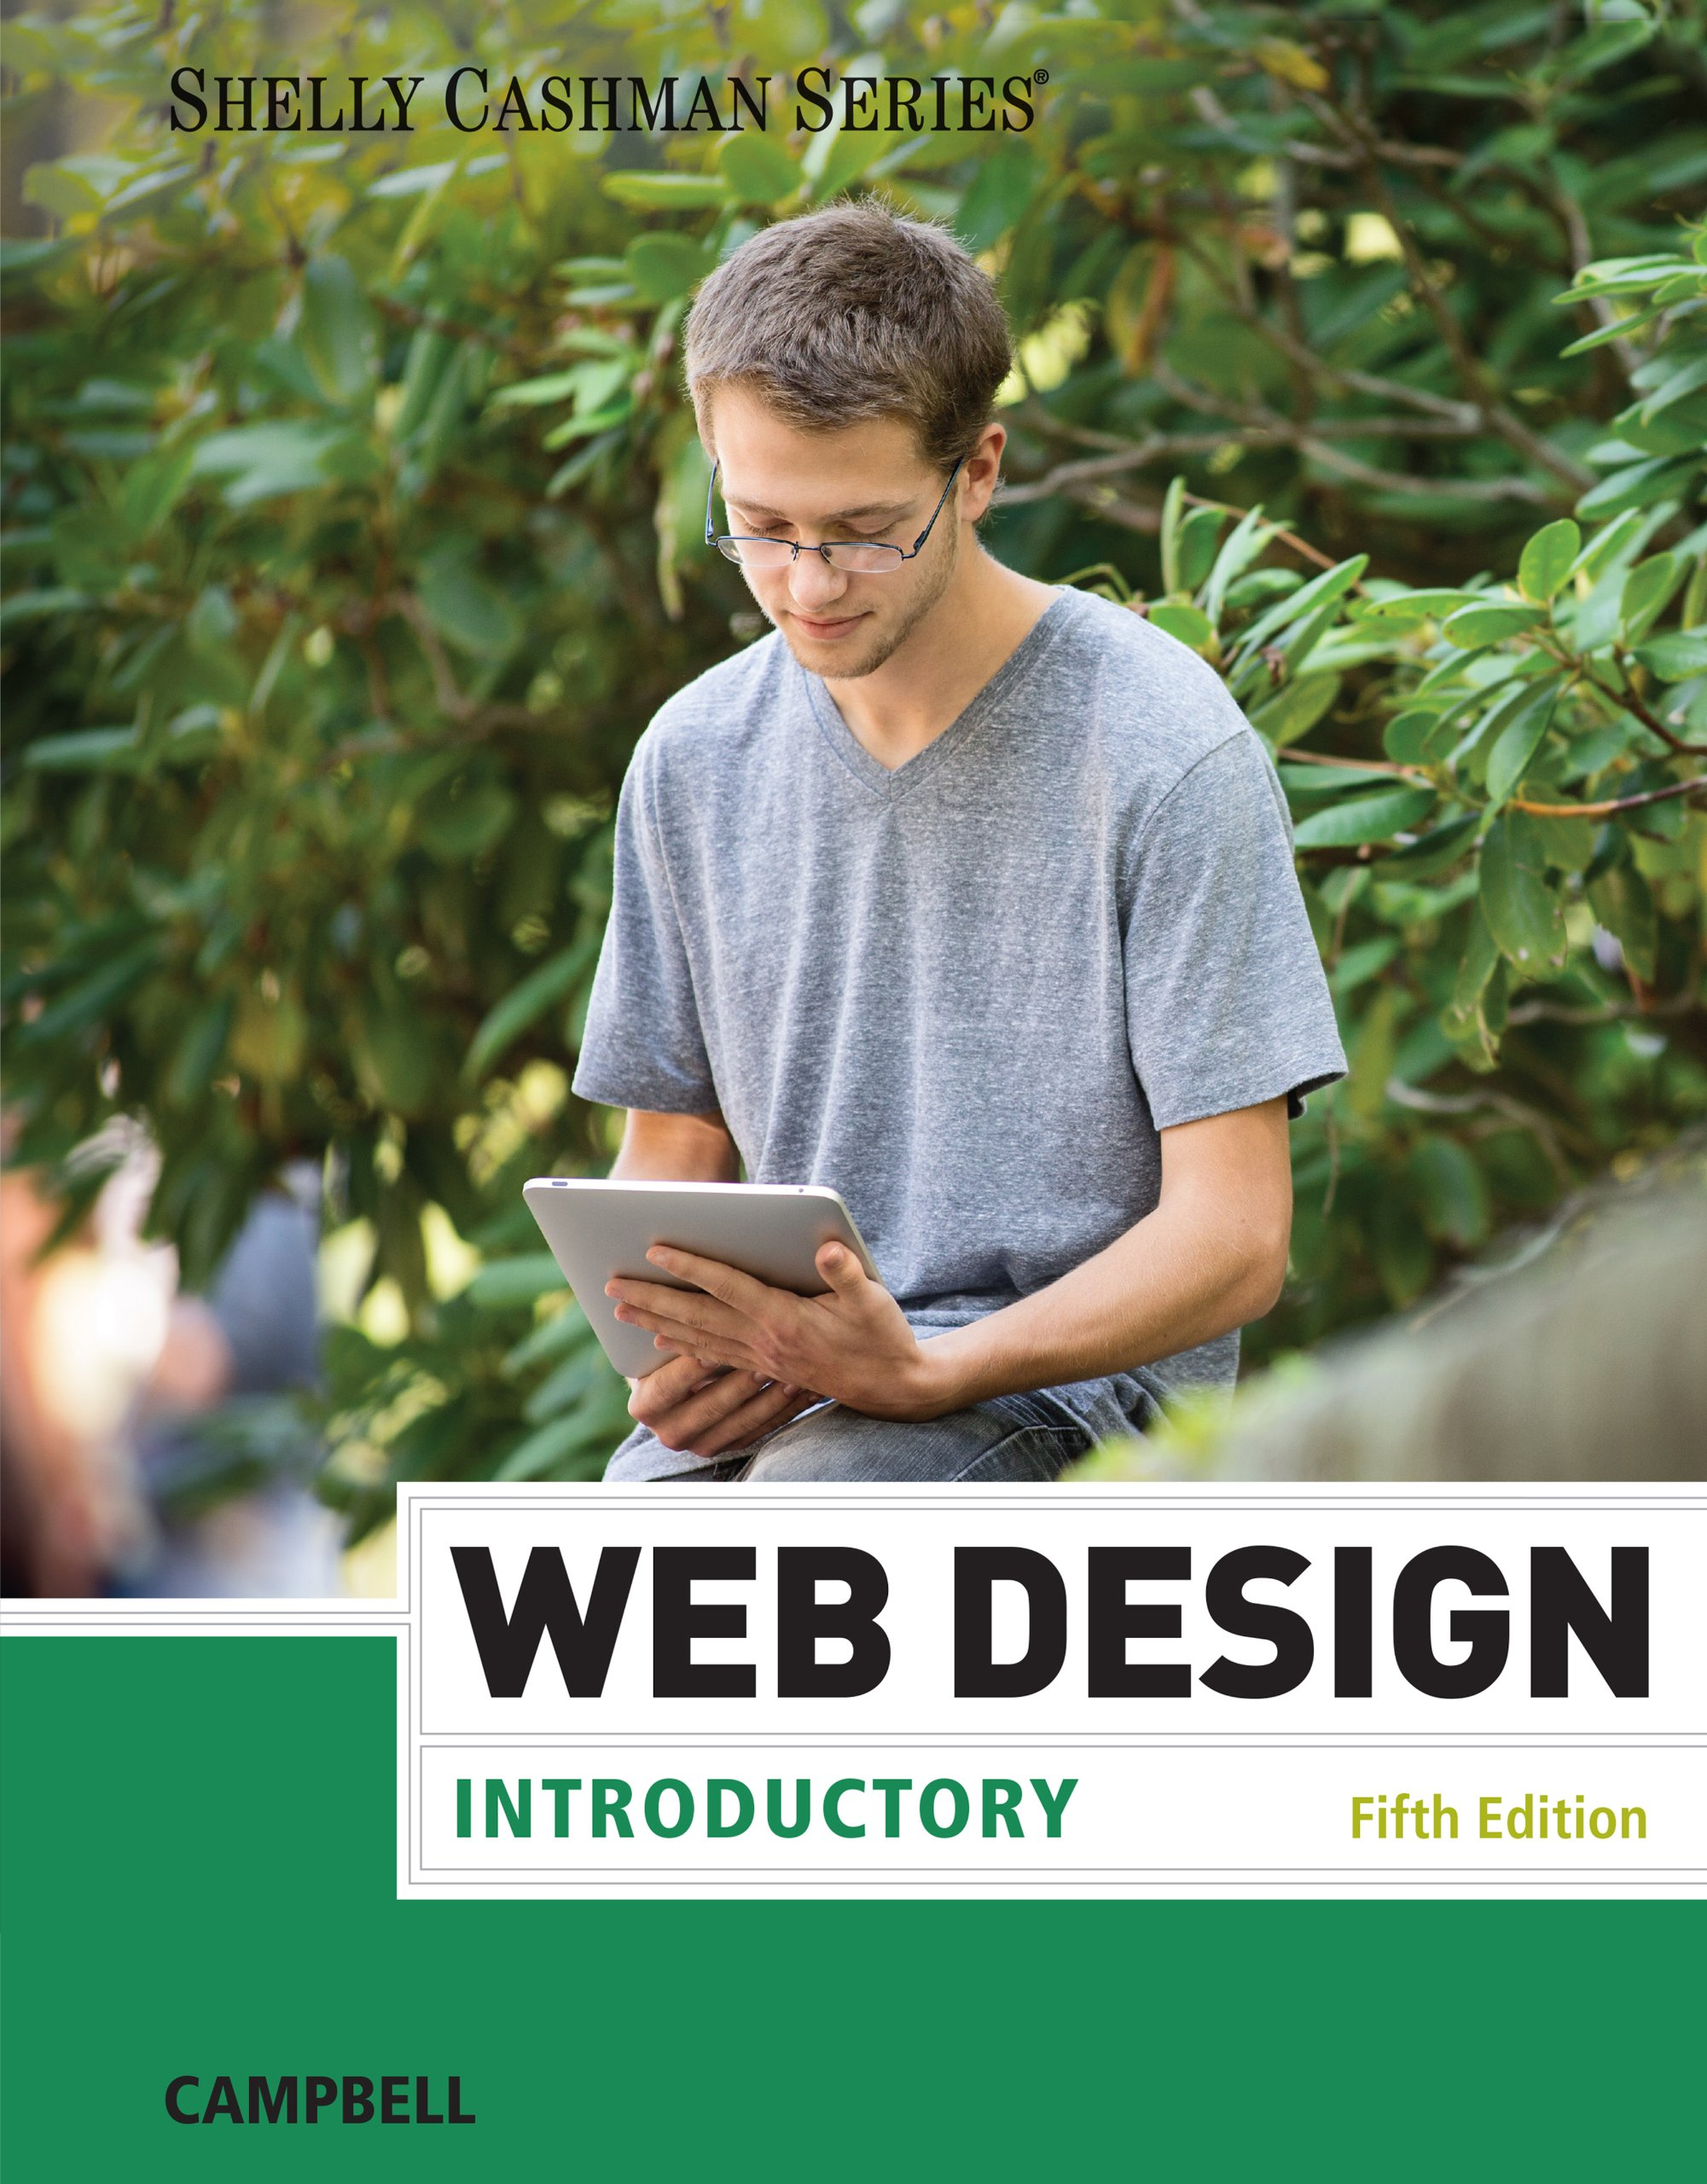 Web Design Introductory Shelly Cashman Series 005 Campbell Jennifer T Ebook Amazon Com